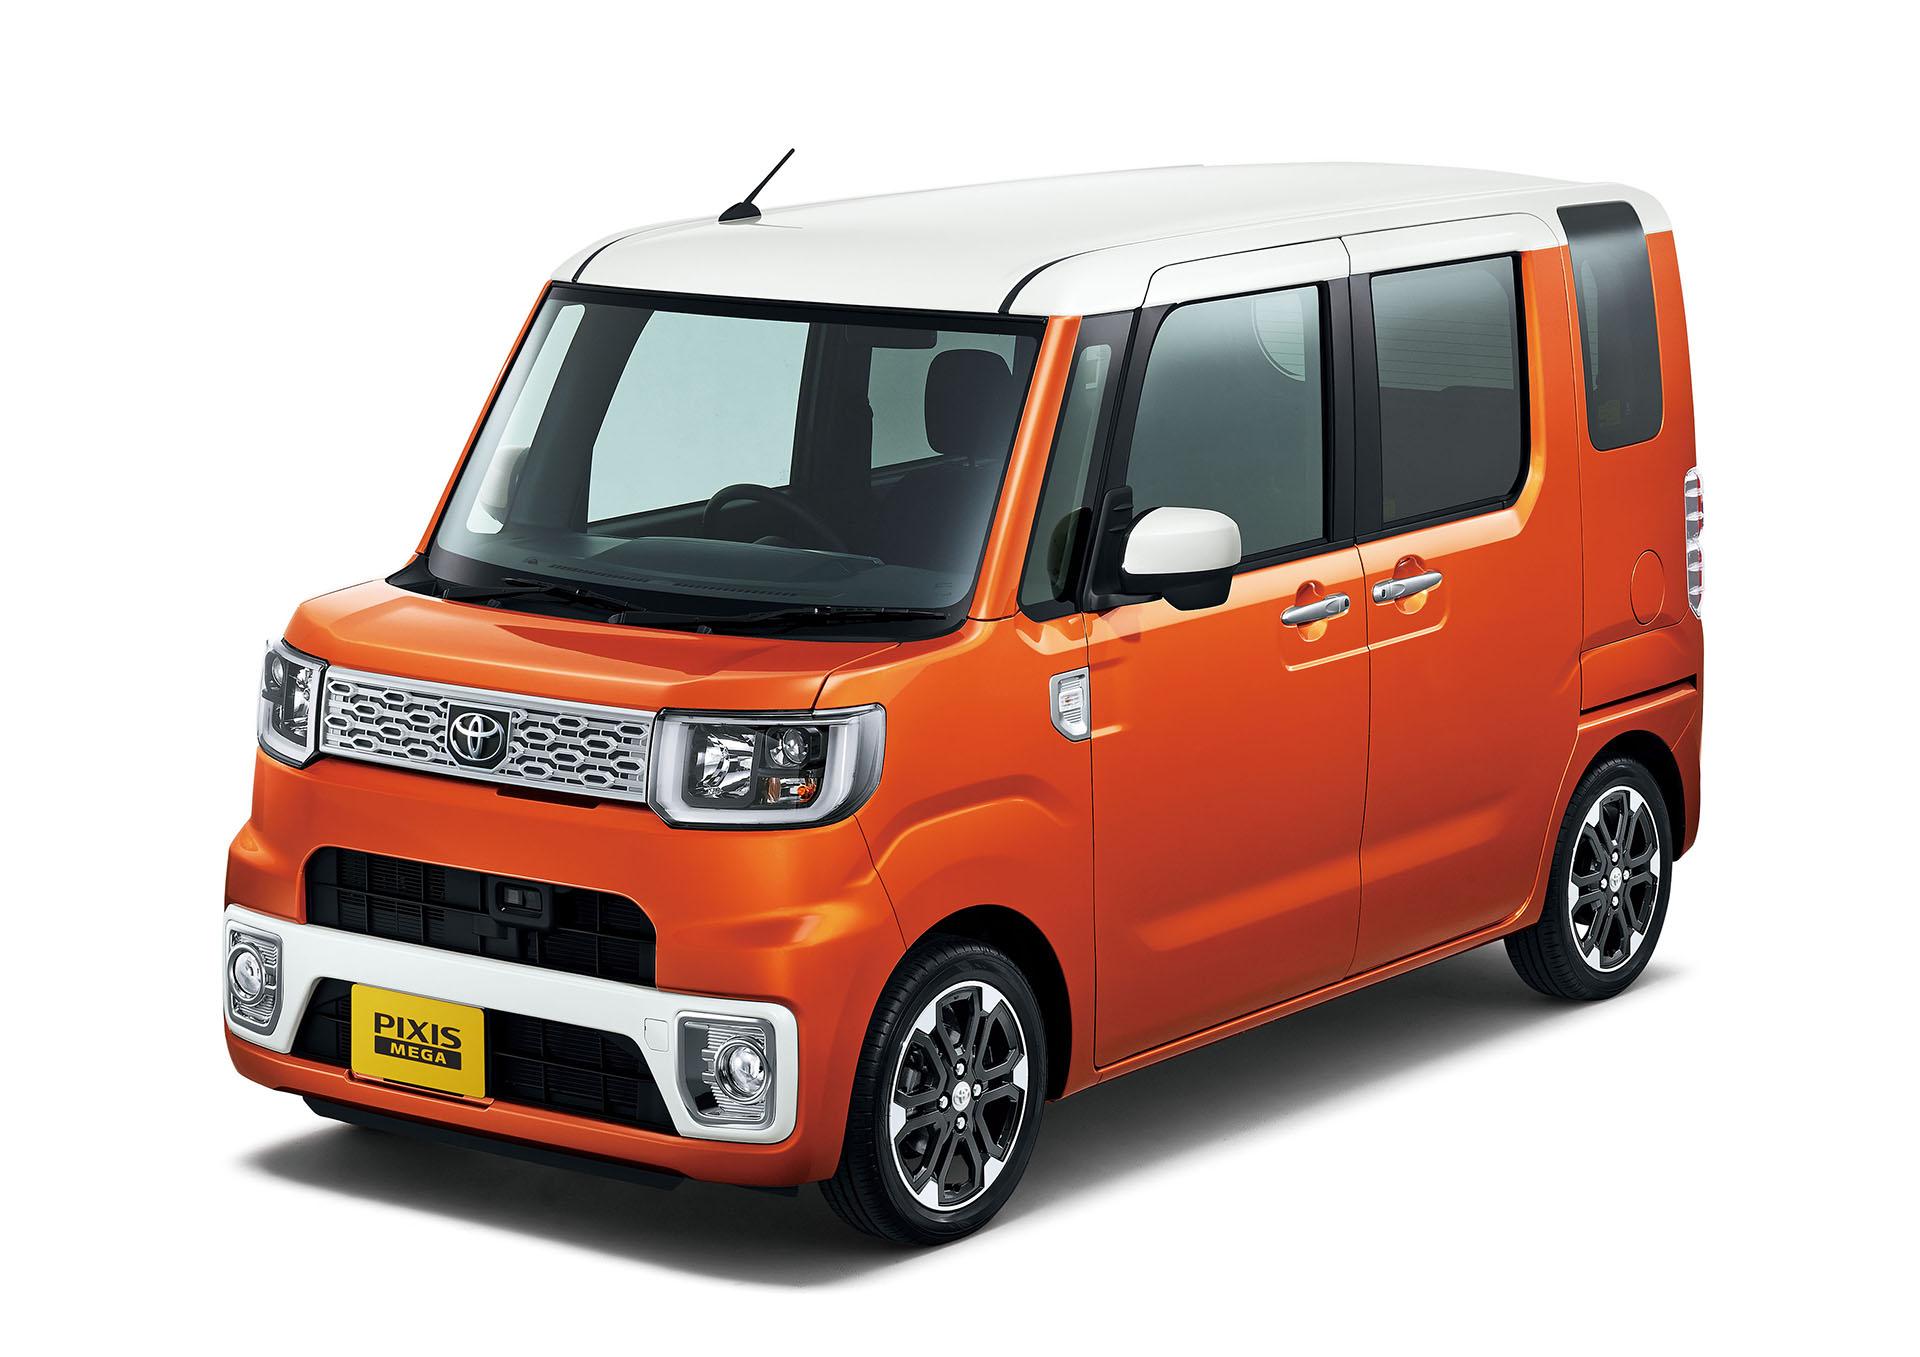 toyota pixis mega is japan 39 s newest ultra cute kei car autoevolution. Black Bedroom Furniture Sets. Home Design Ideas